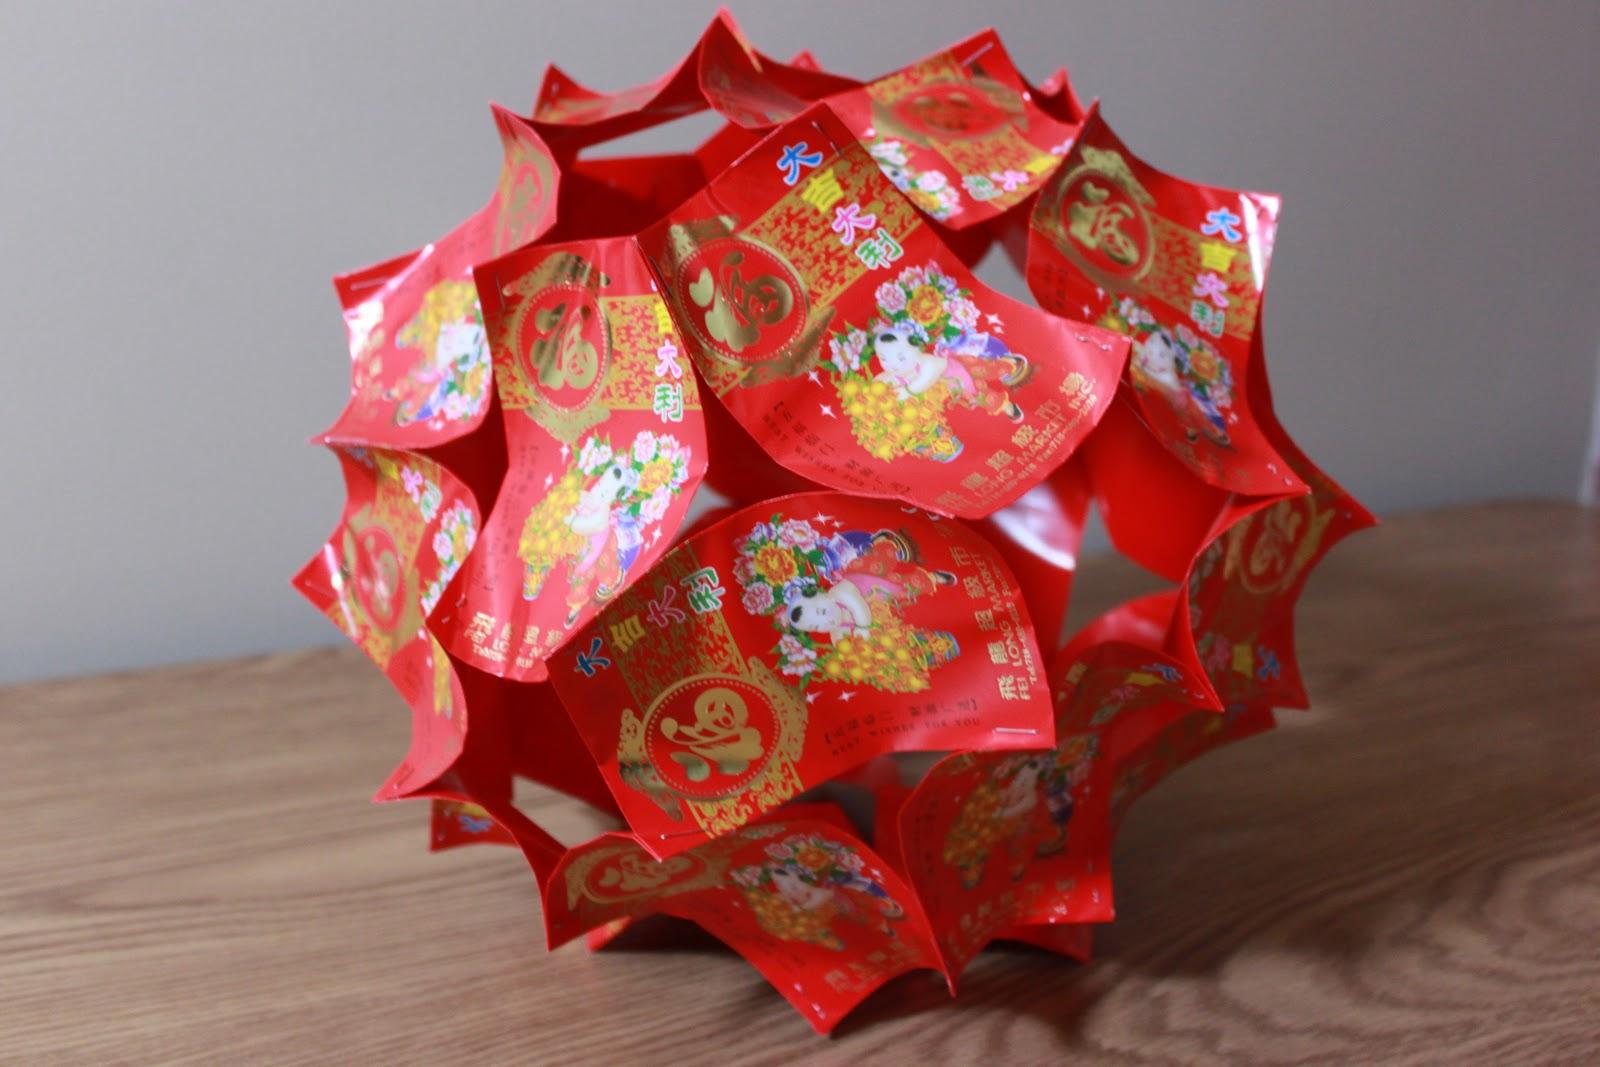 Chinese Red Envelope Decor — Christina of Chinatown